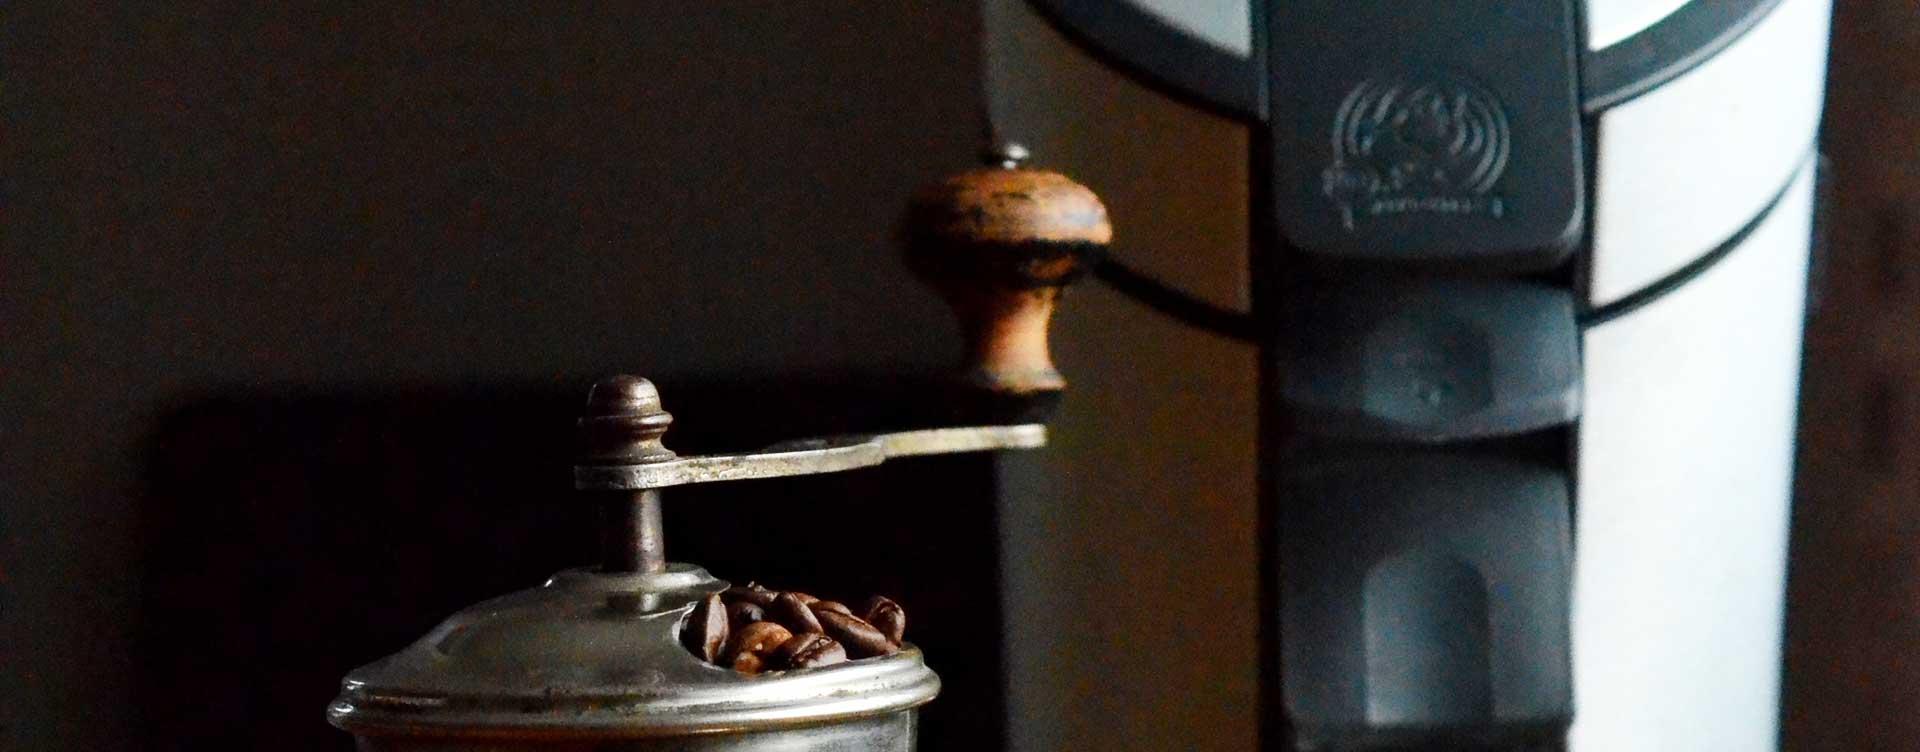 Kaffeepadmaschine